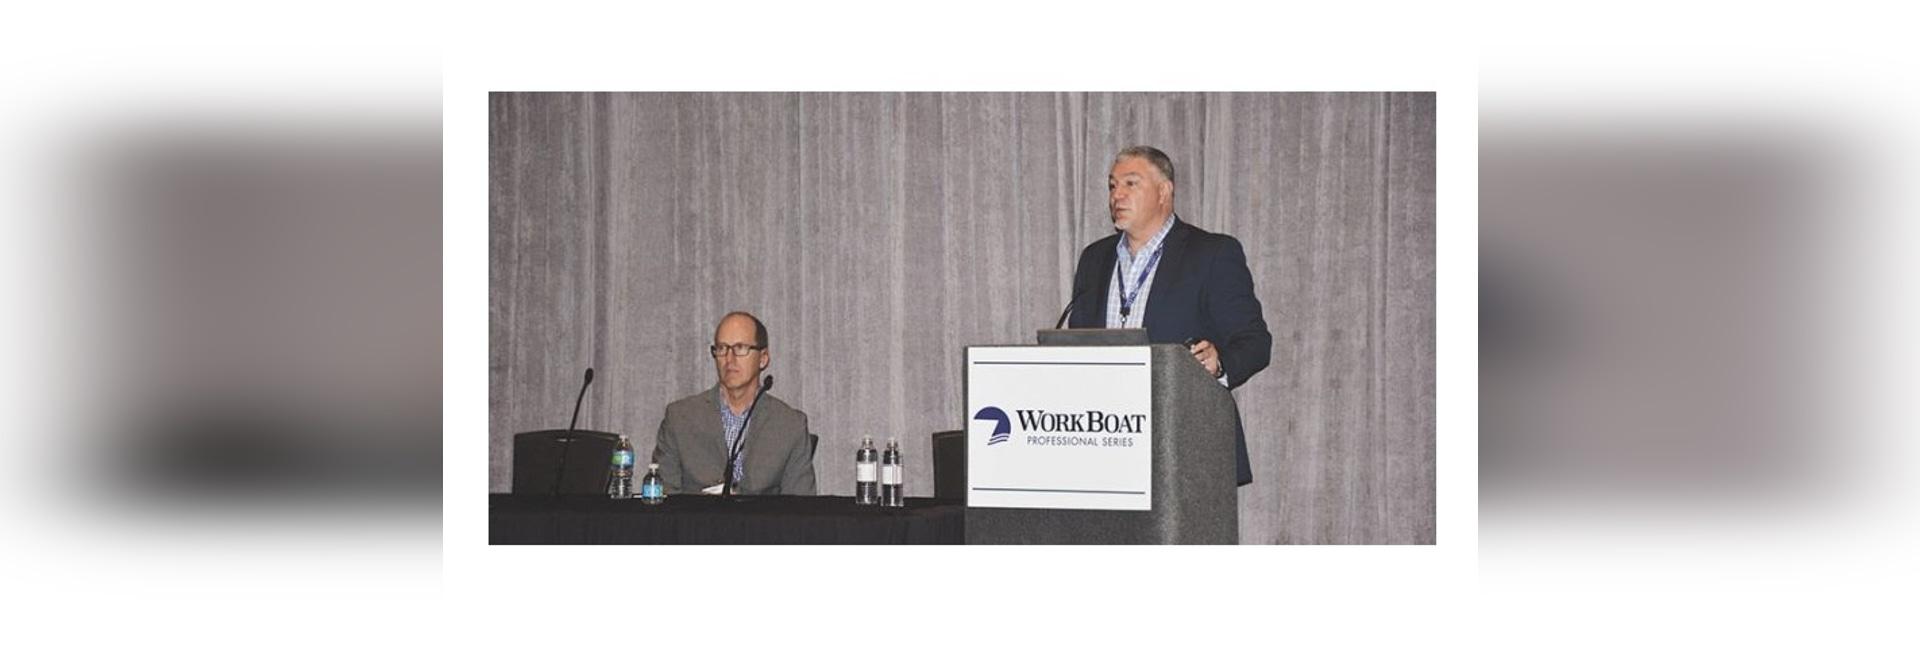 Chris DeWitt (left) and Steve Burke discuss cybersecurity at the 2016 International WorkBoat Show. Doug Stewart photo.